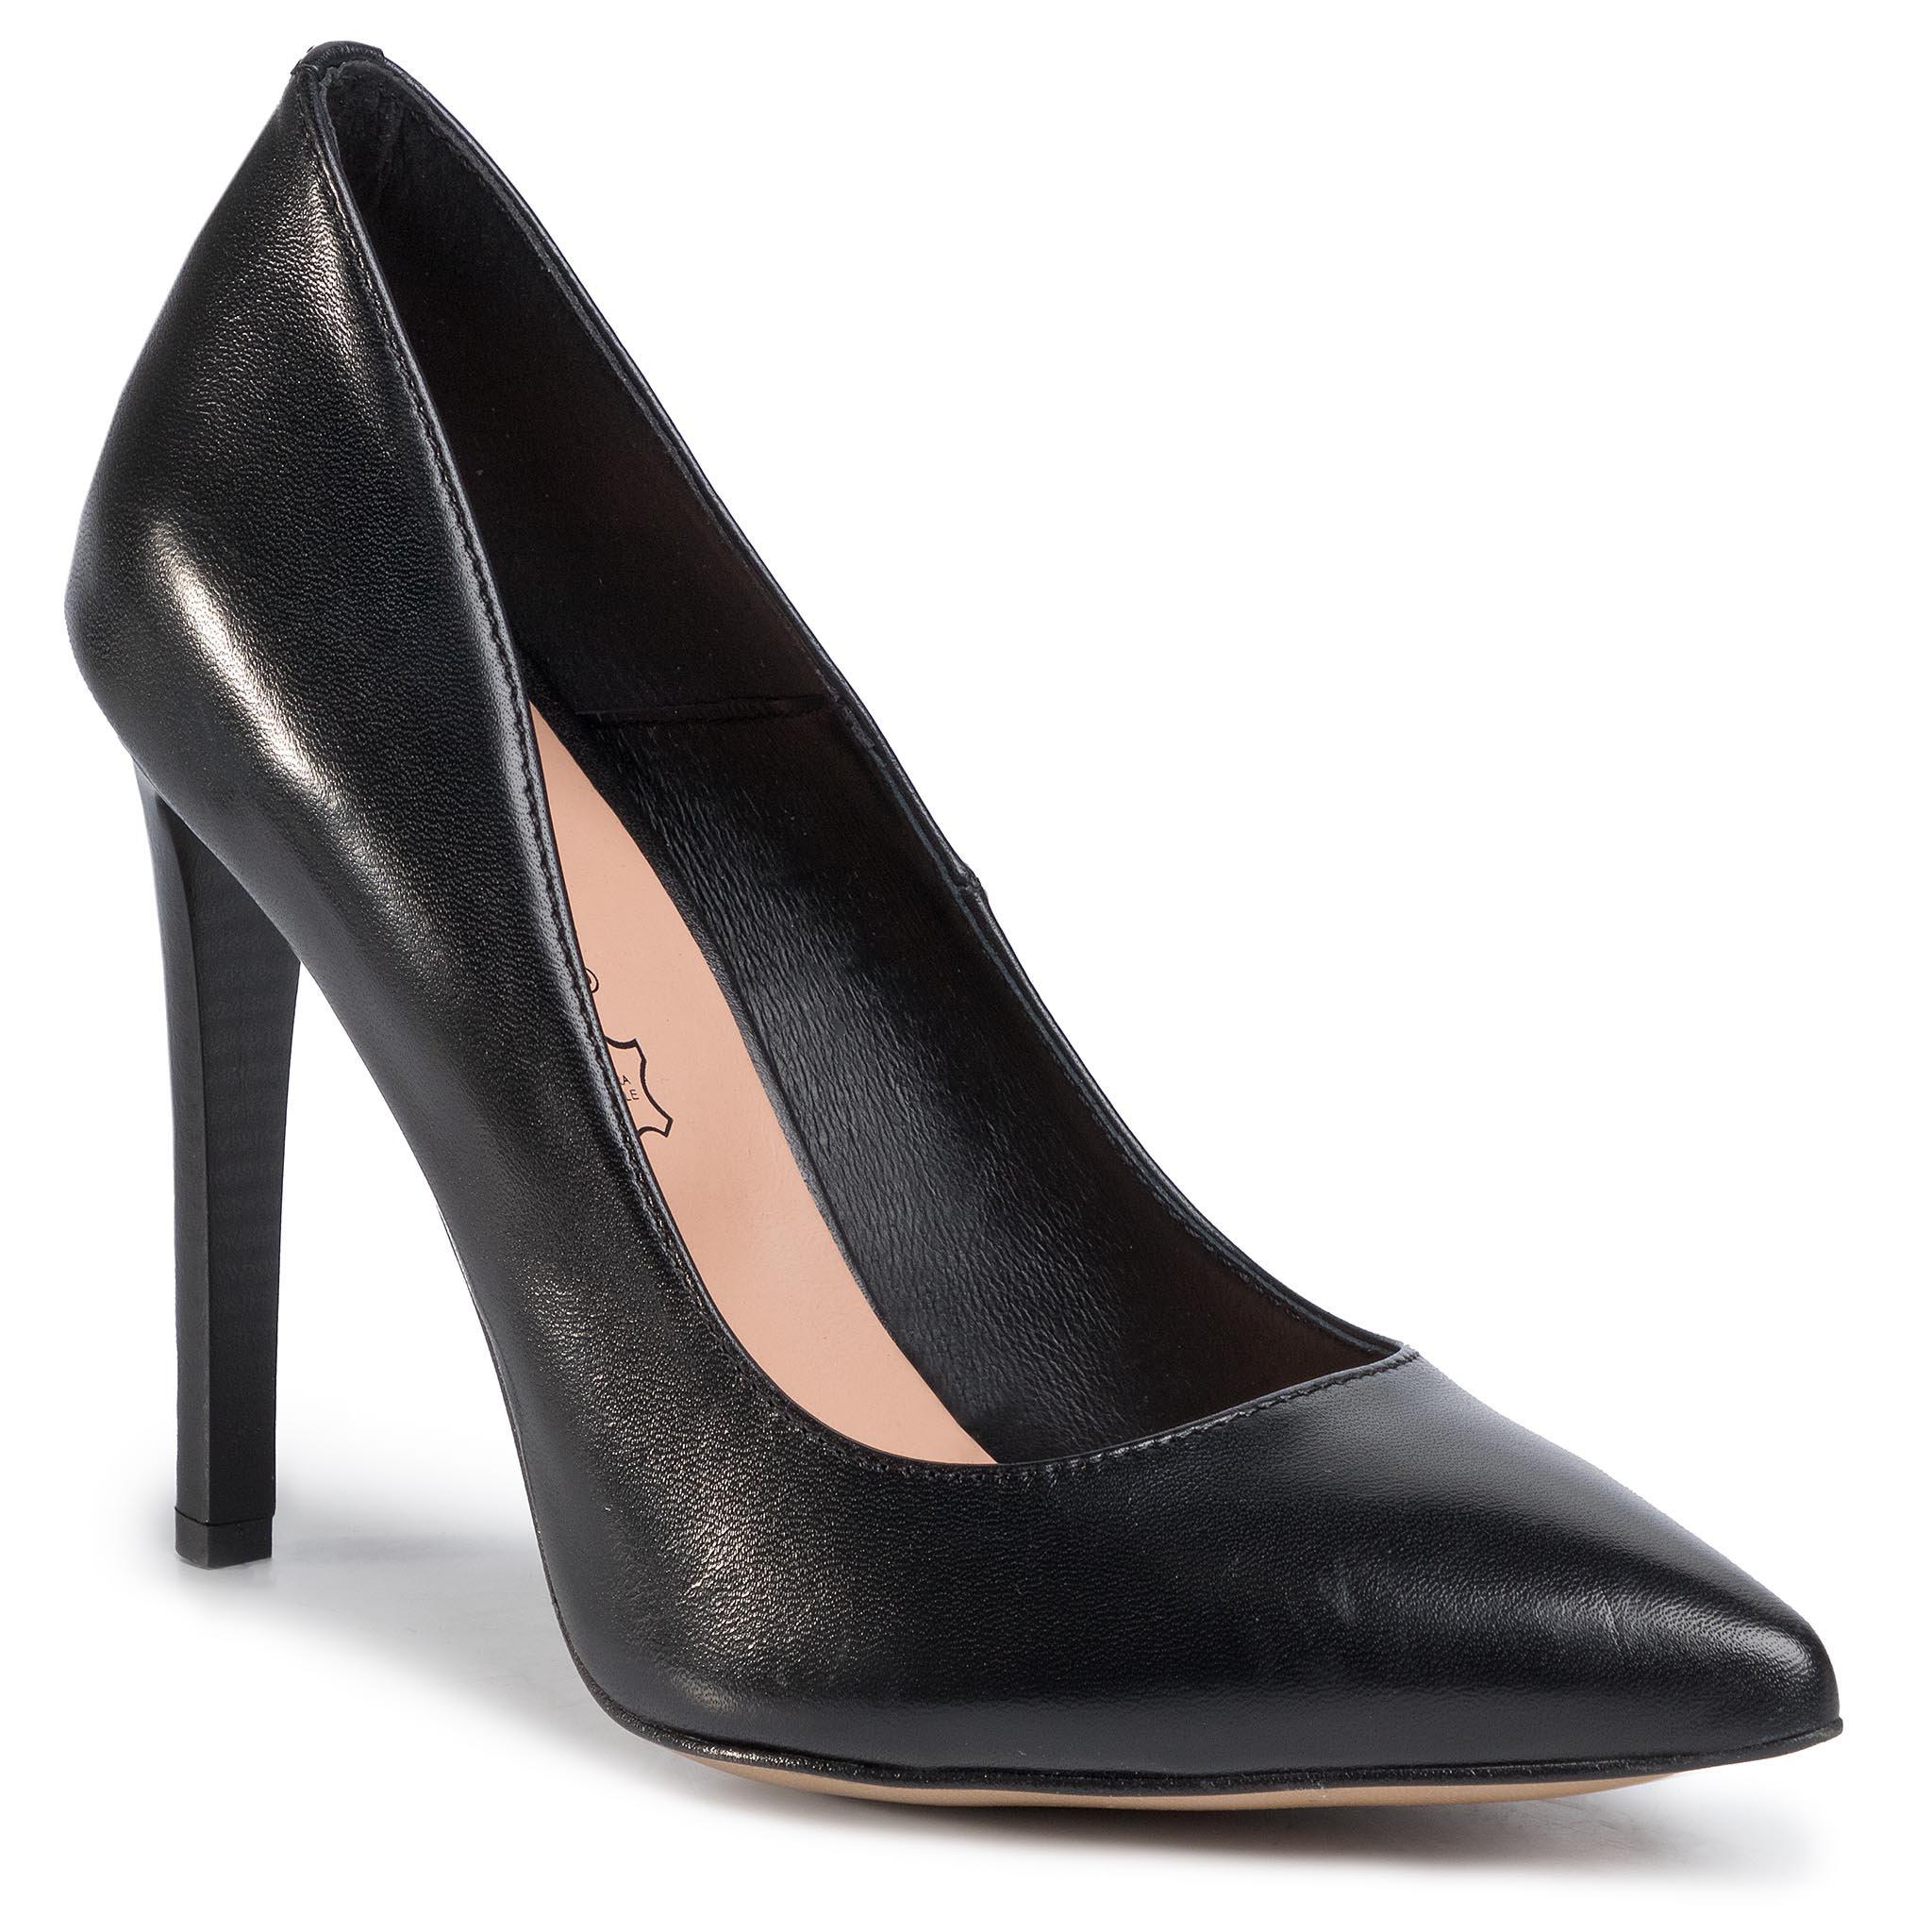 Tűsarkú LASOCKI - 70534-01 Black - Tűsarkú cipő - Félcipő - Női